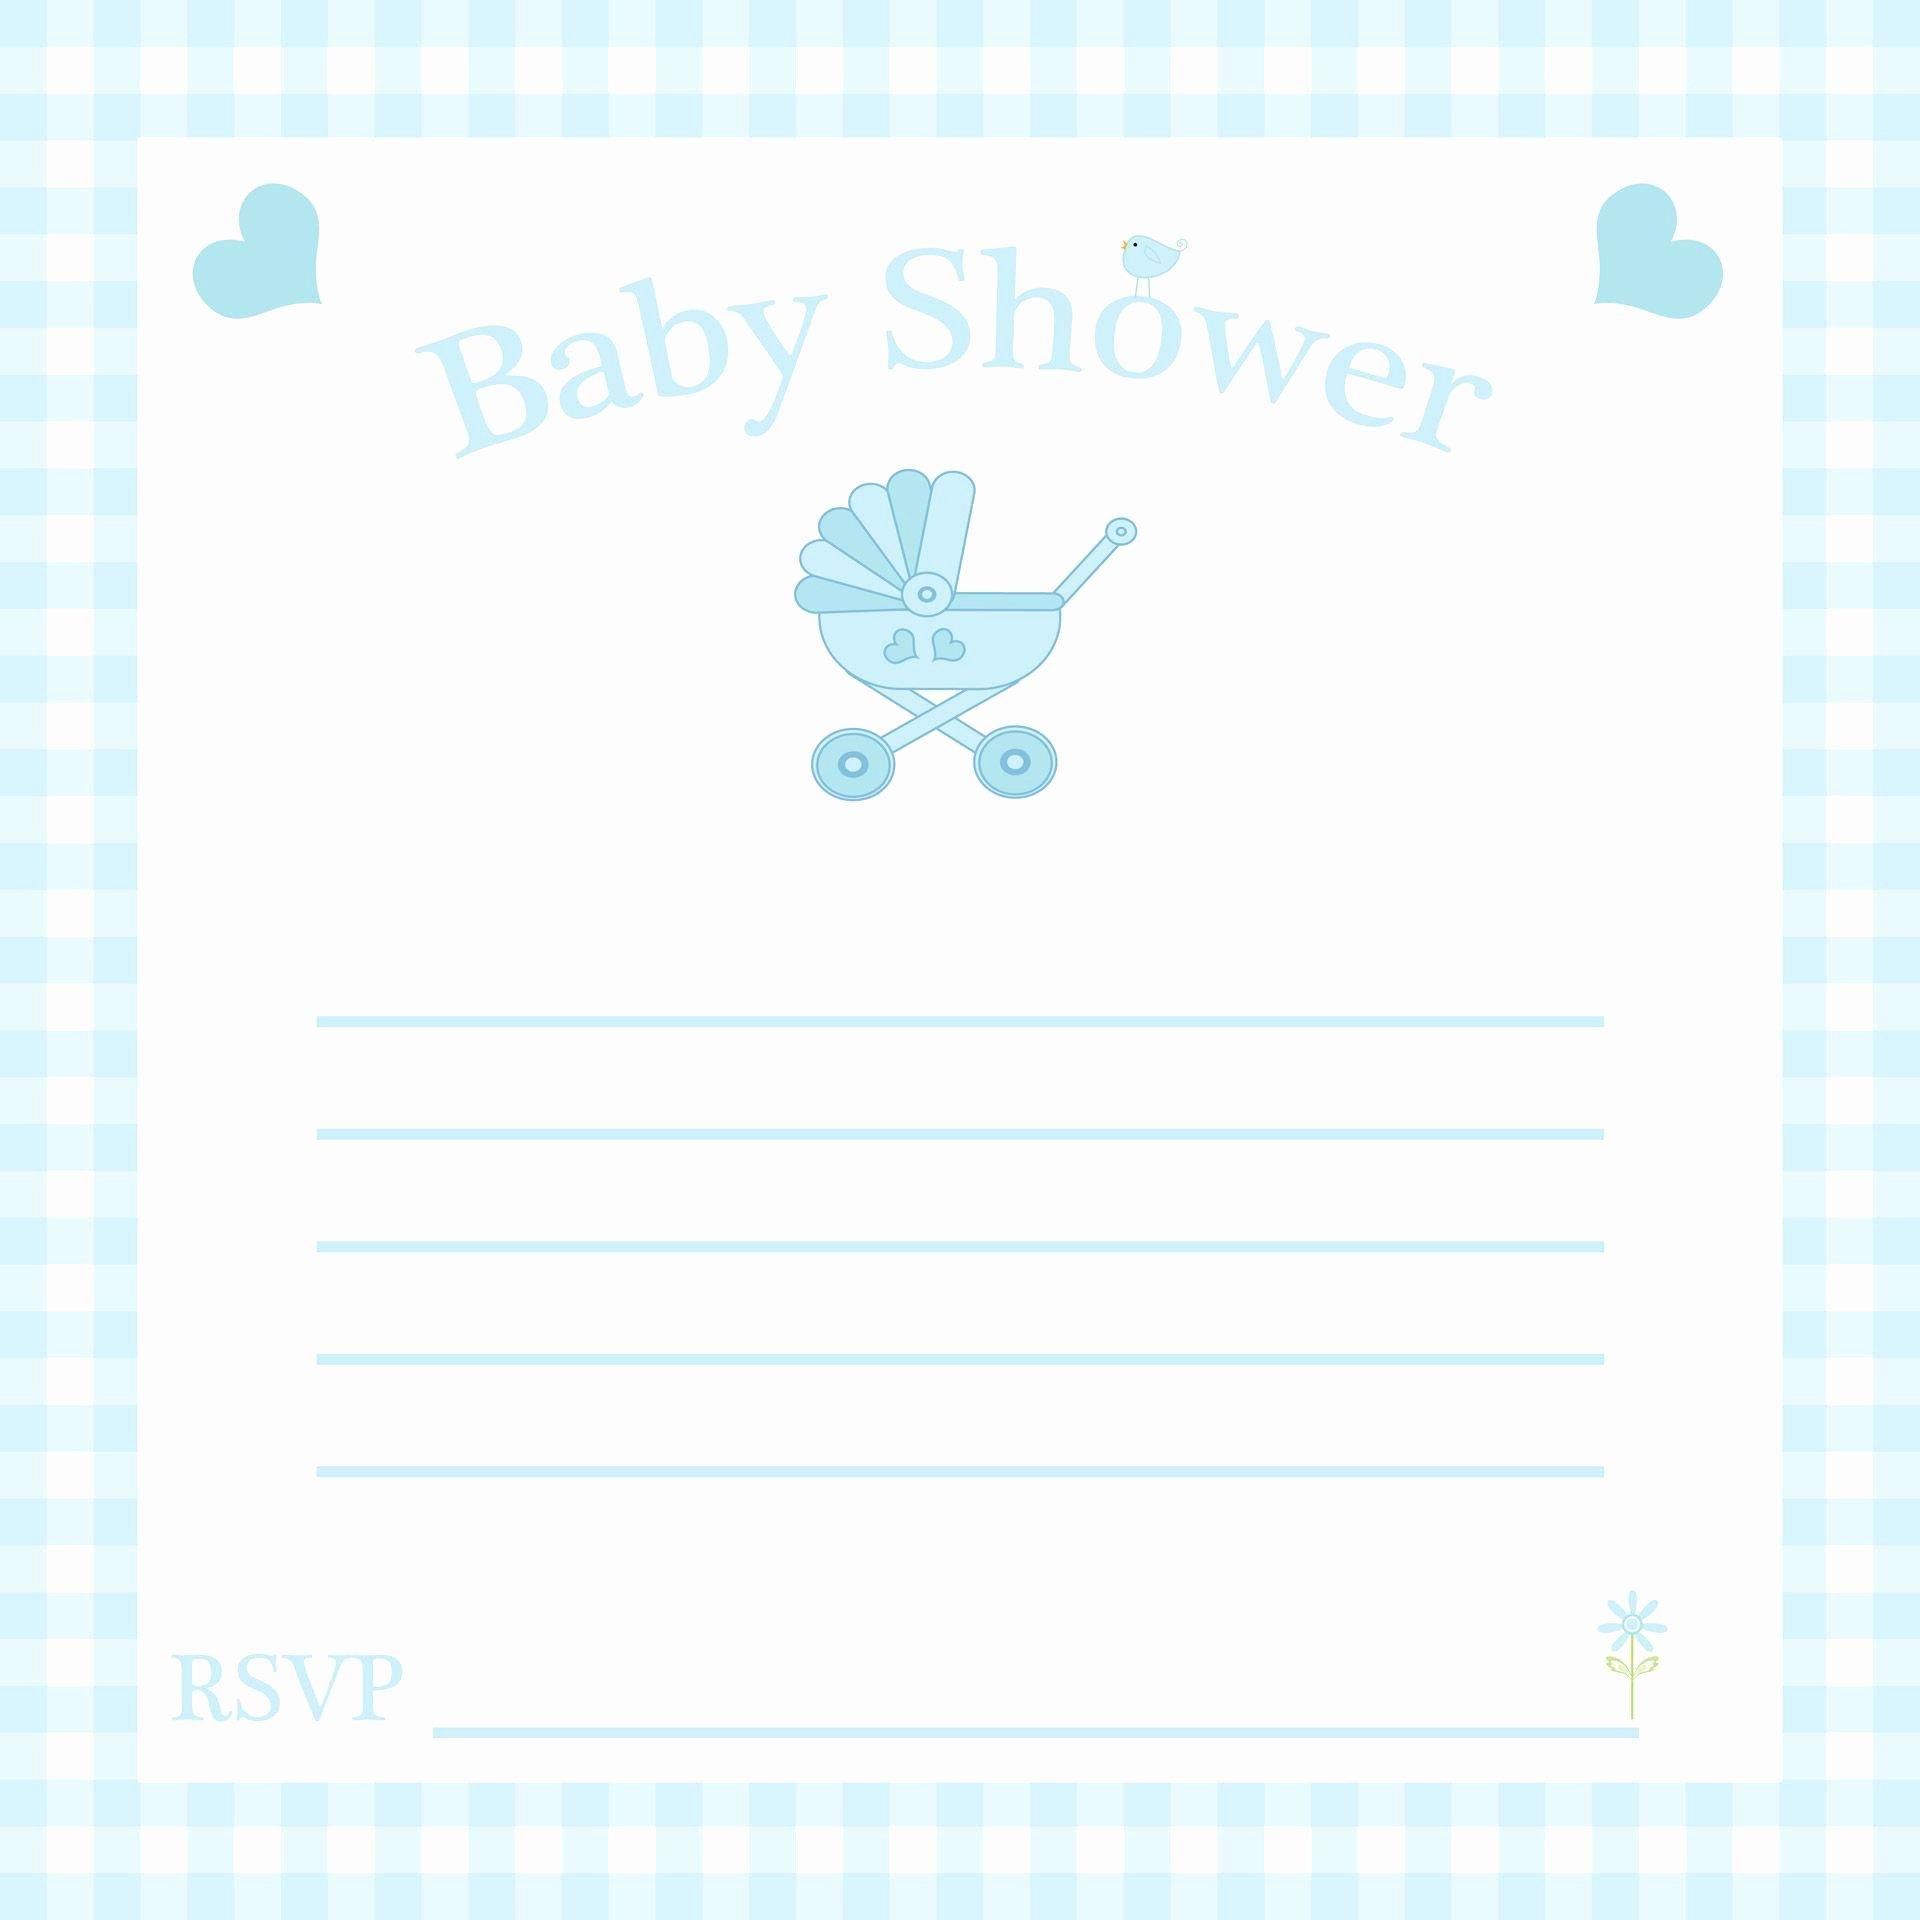 Free Baby Shower Invitation Templates Elegant Graduation Party Free Baby Invitation Template Card